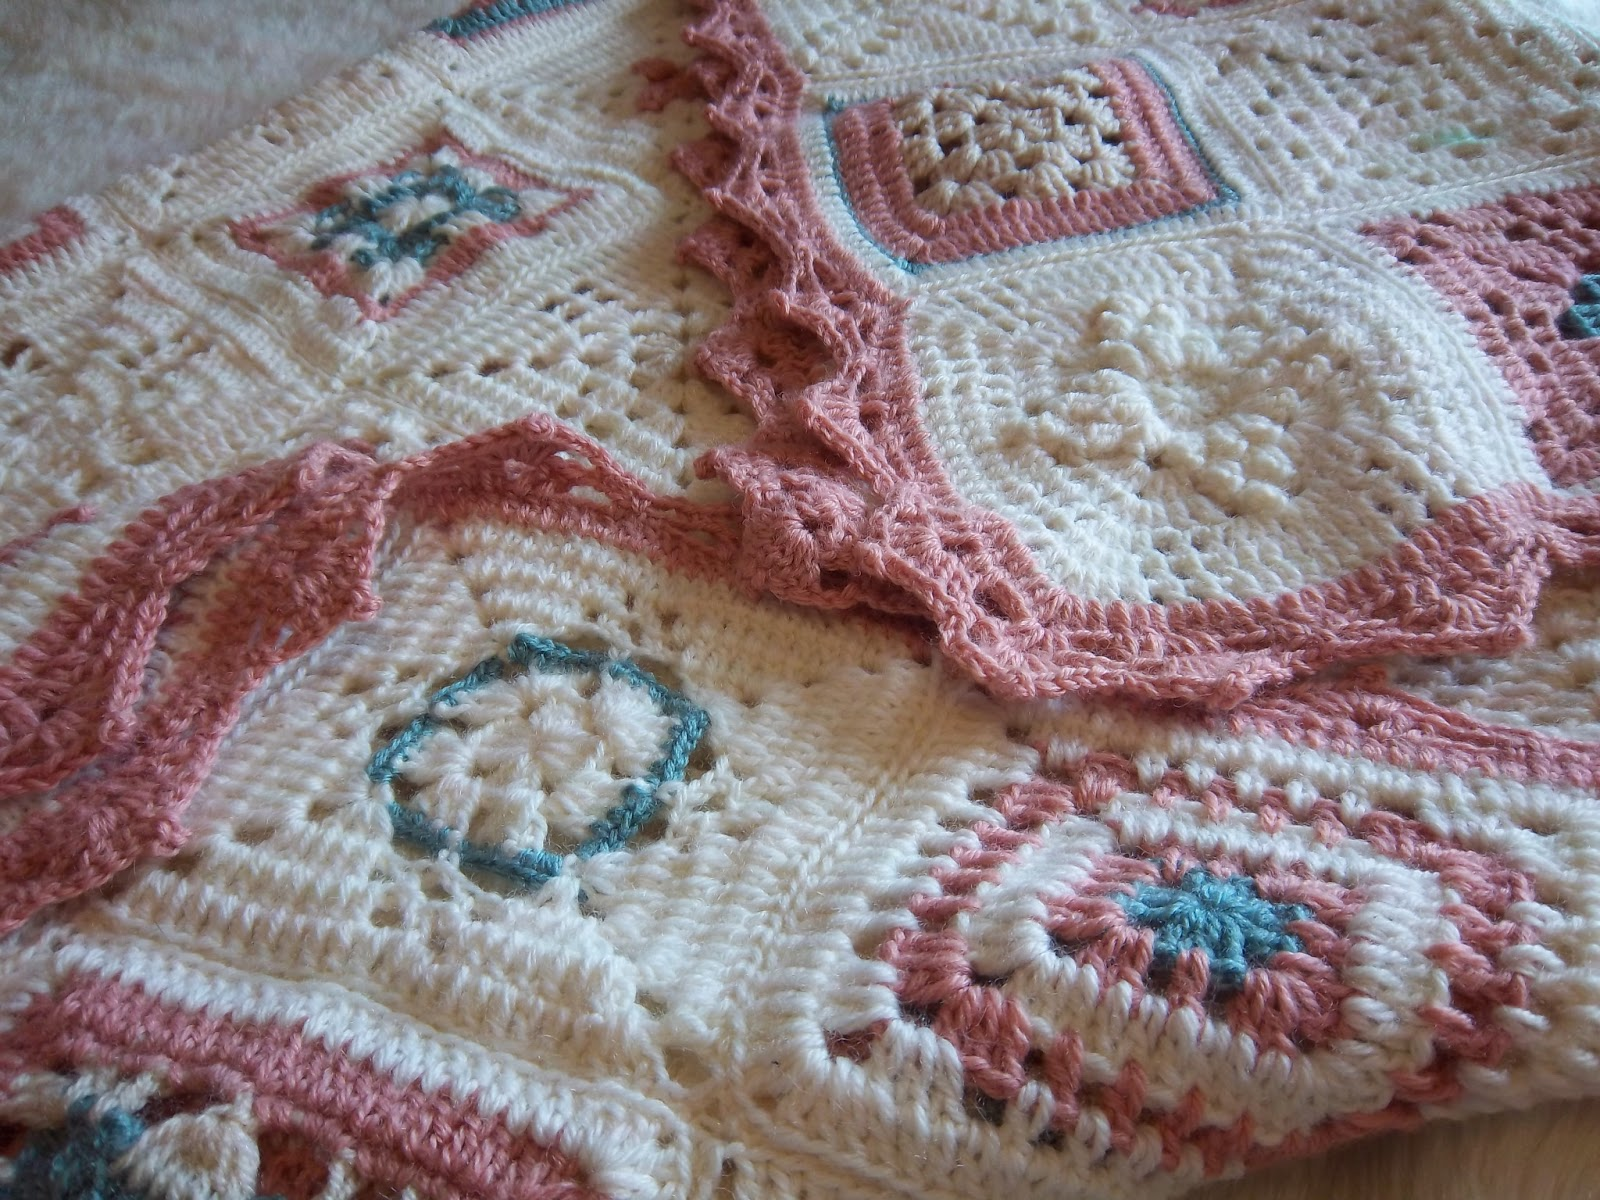 Mi sala de costura colcha ganchillo en tonos pastel - Colchas ganchillo bebe ...